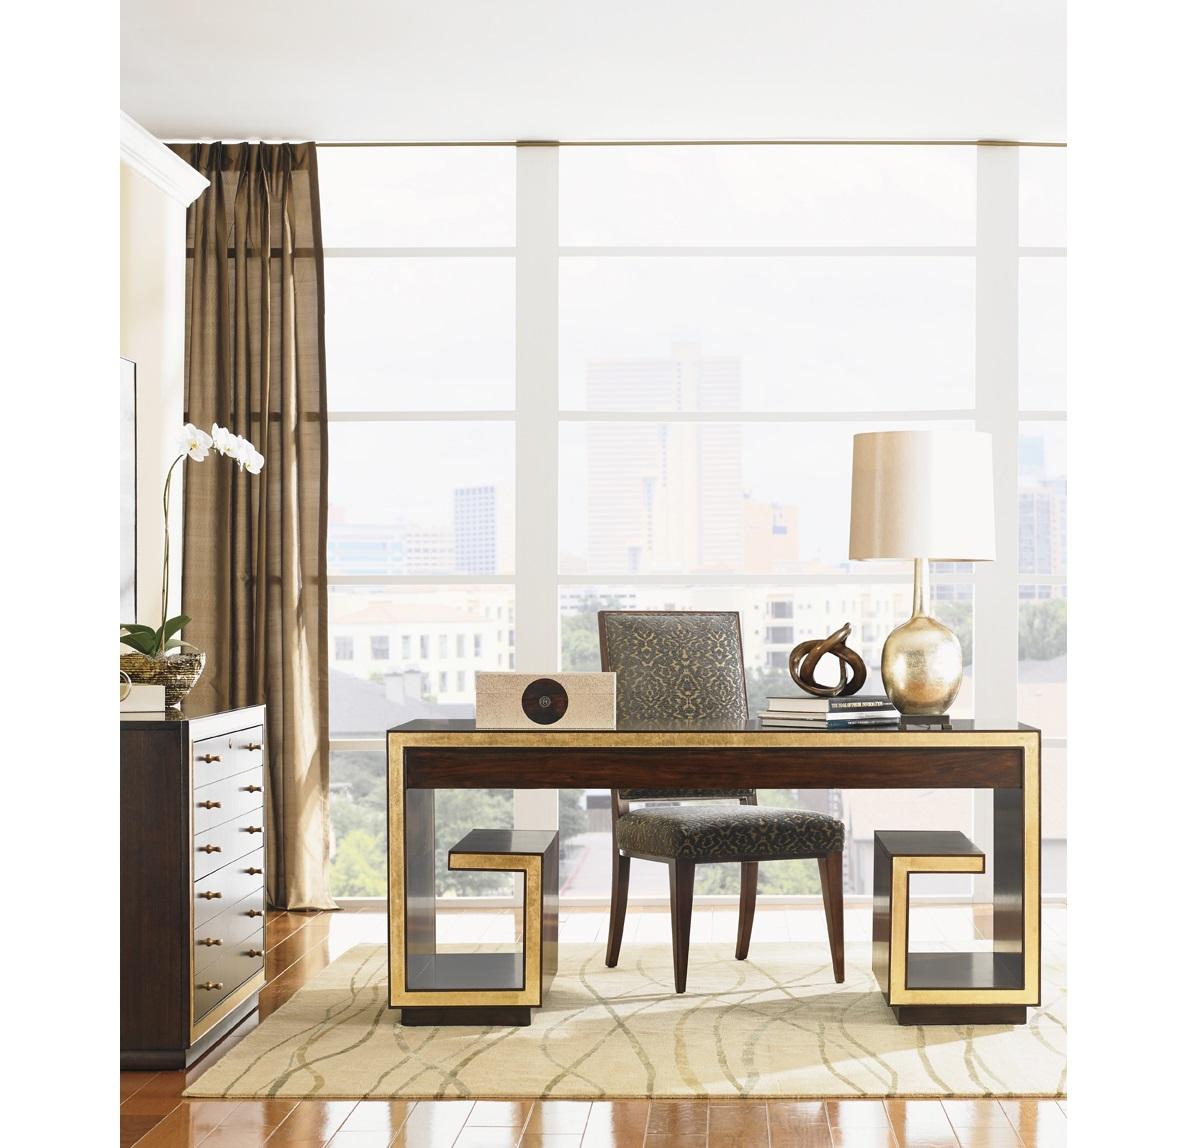 Lexington Home Brands Writing Desk Brooklyn, New York